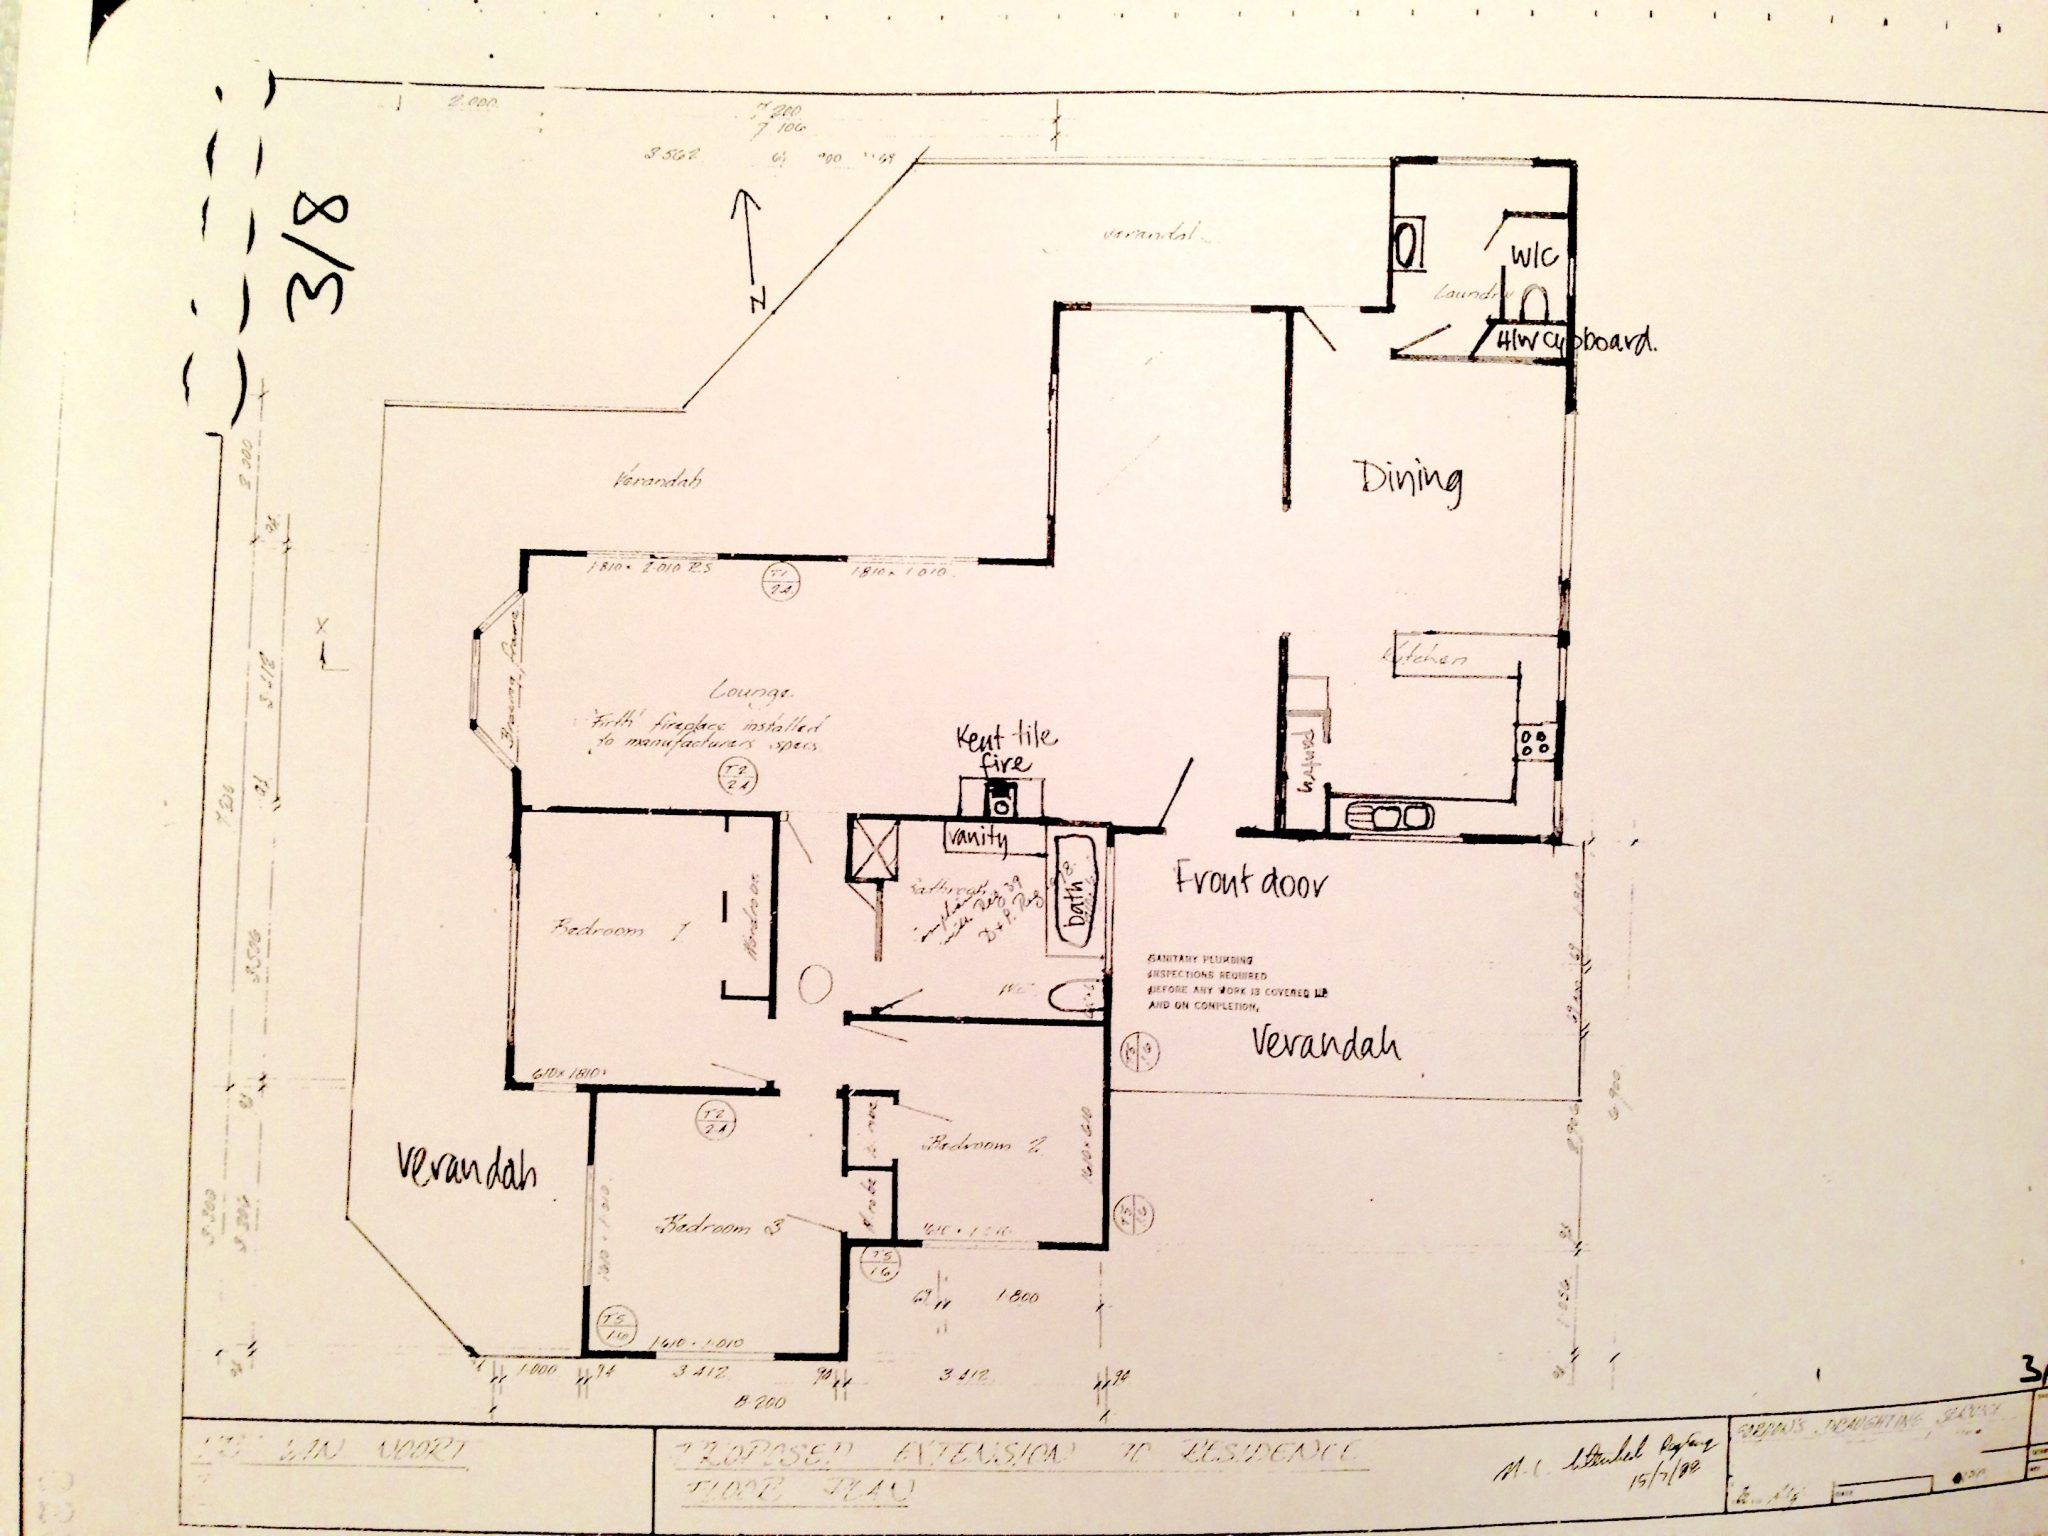 CEDARS house plan.